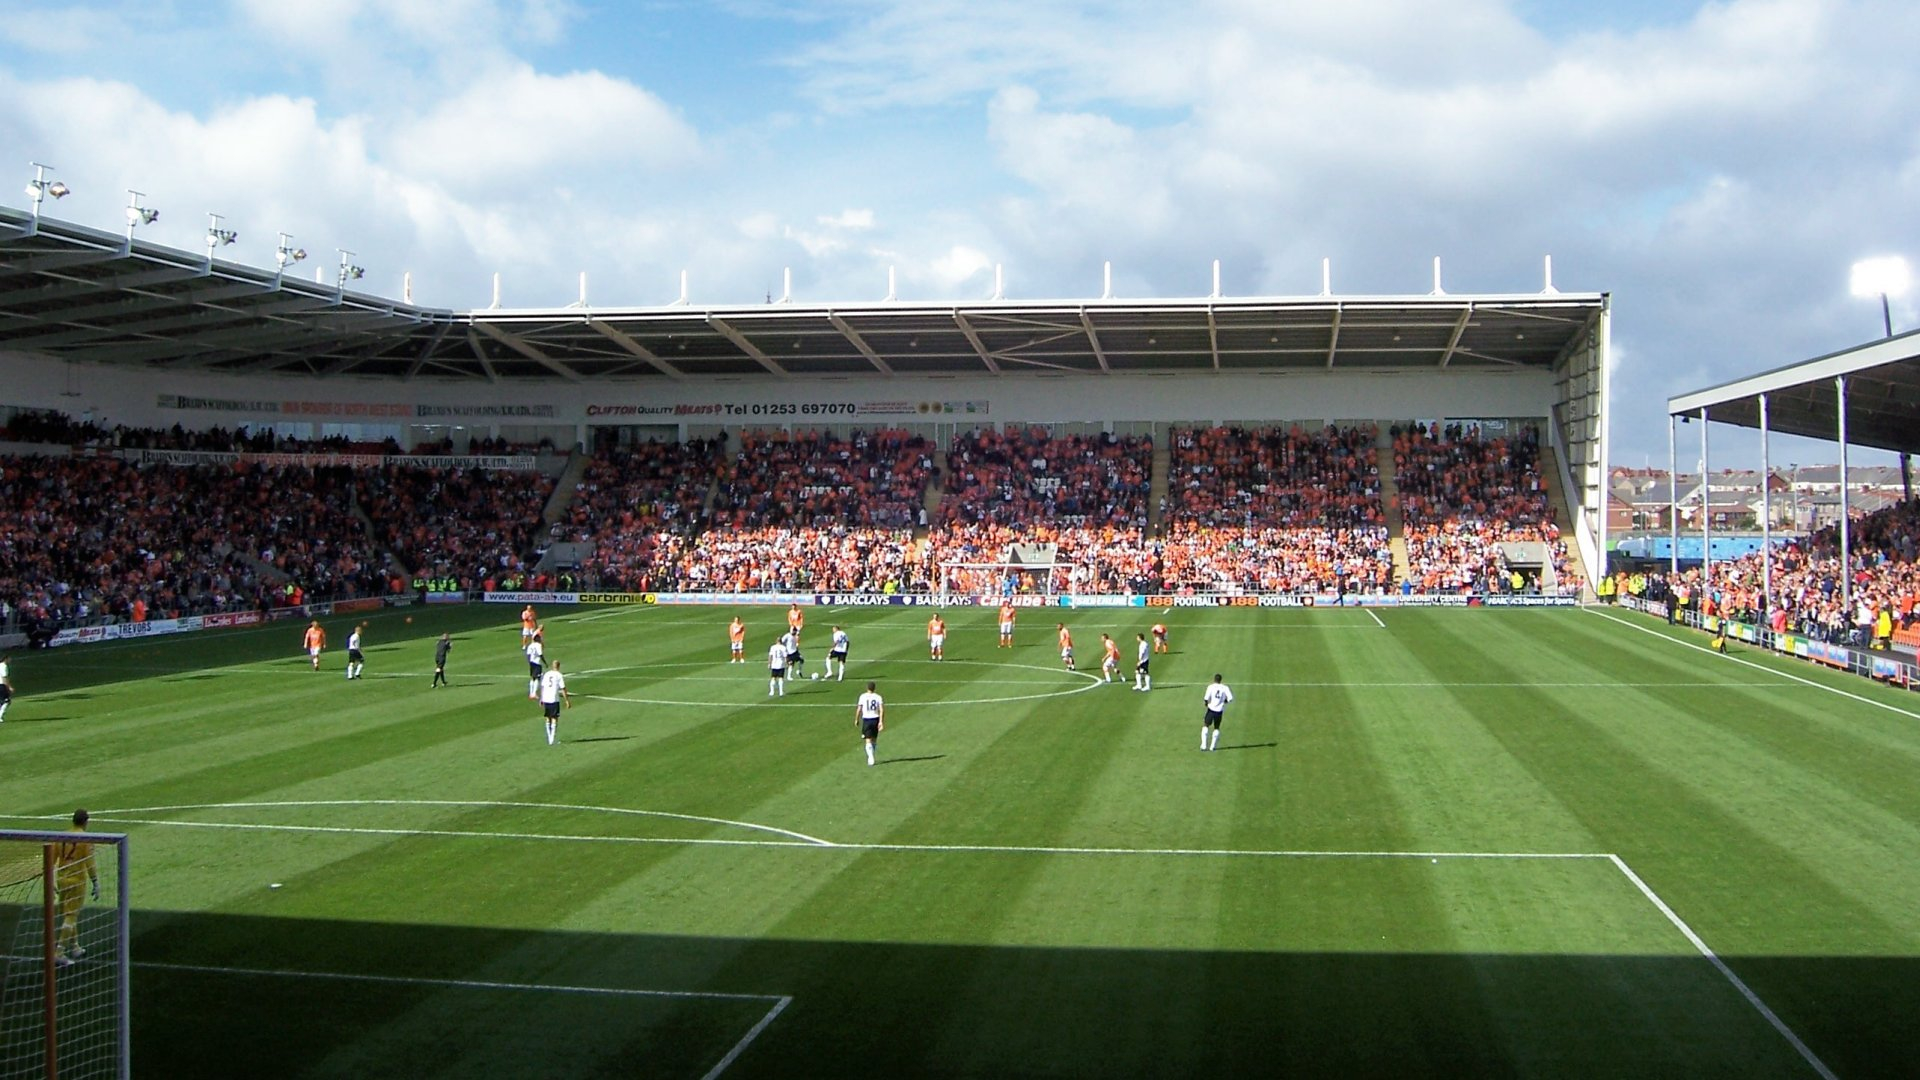 Blackpool F.C. (Football Club) Of The Barclay's Premier League